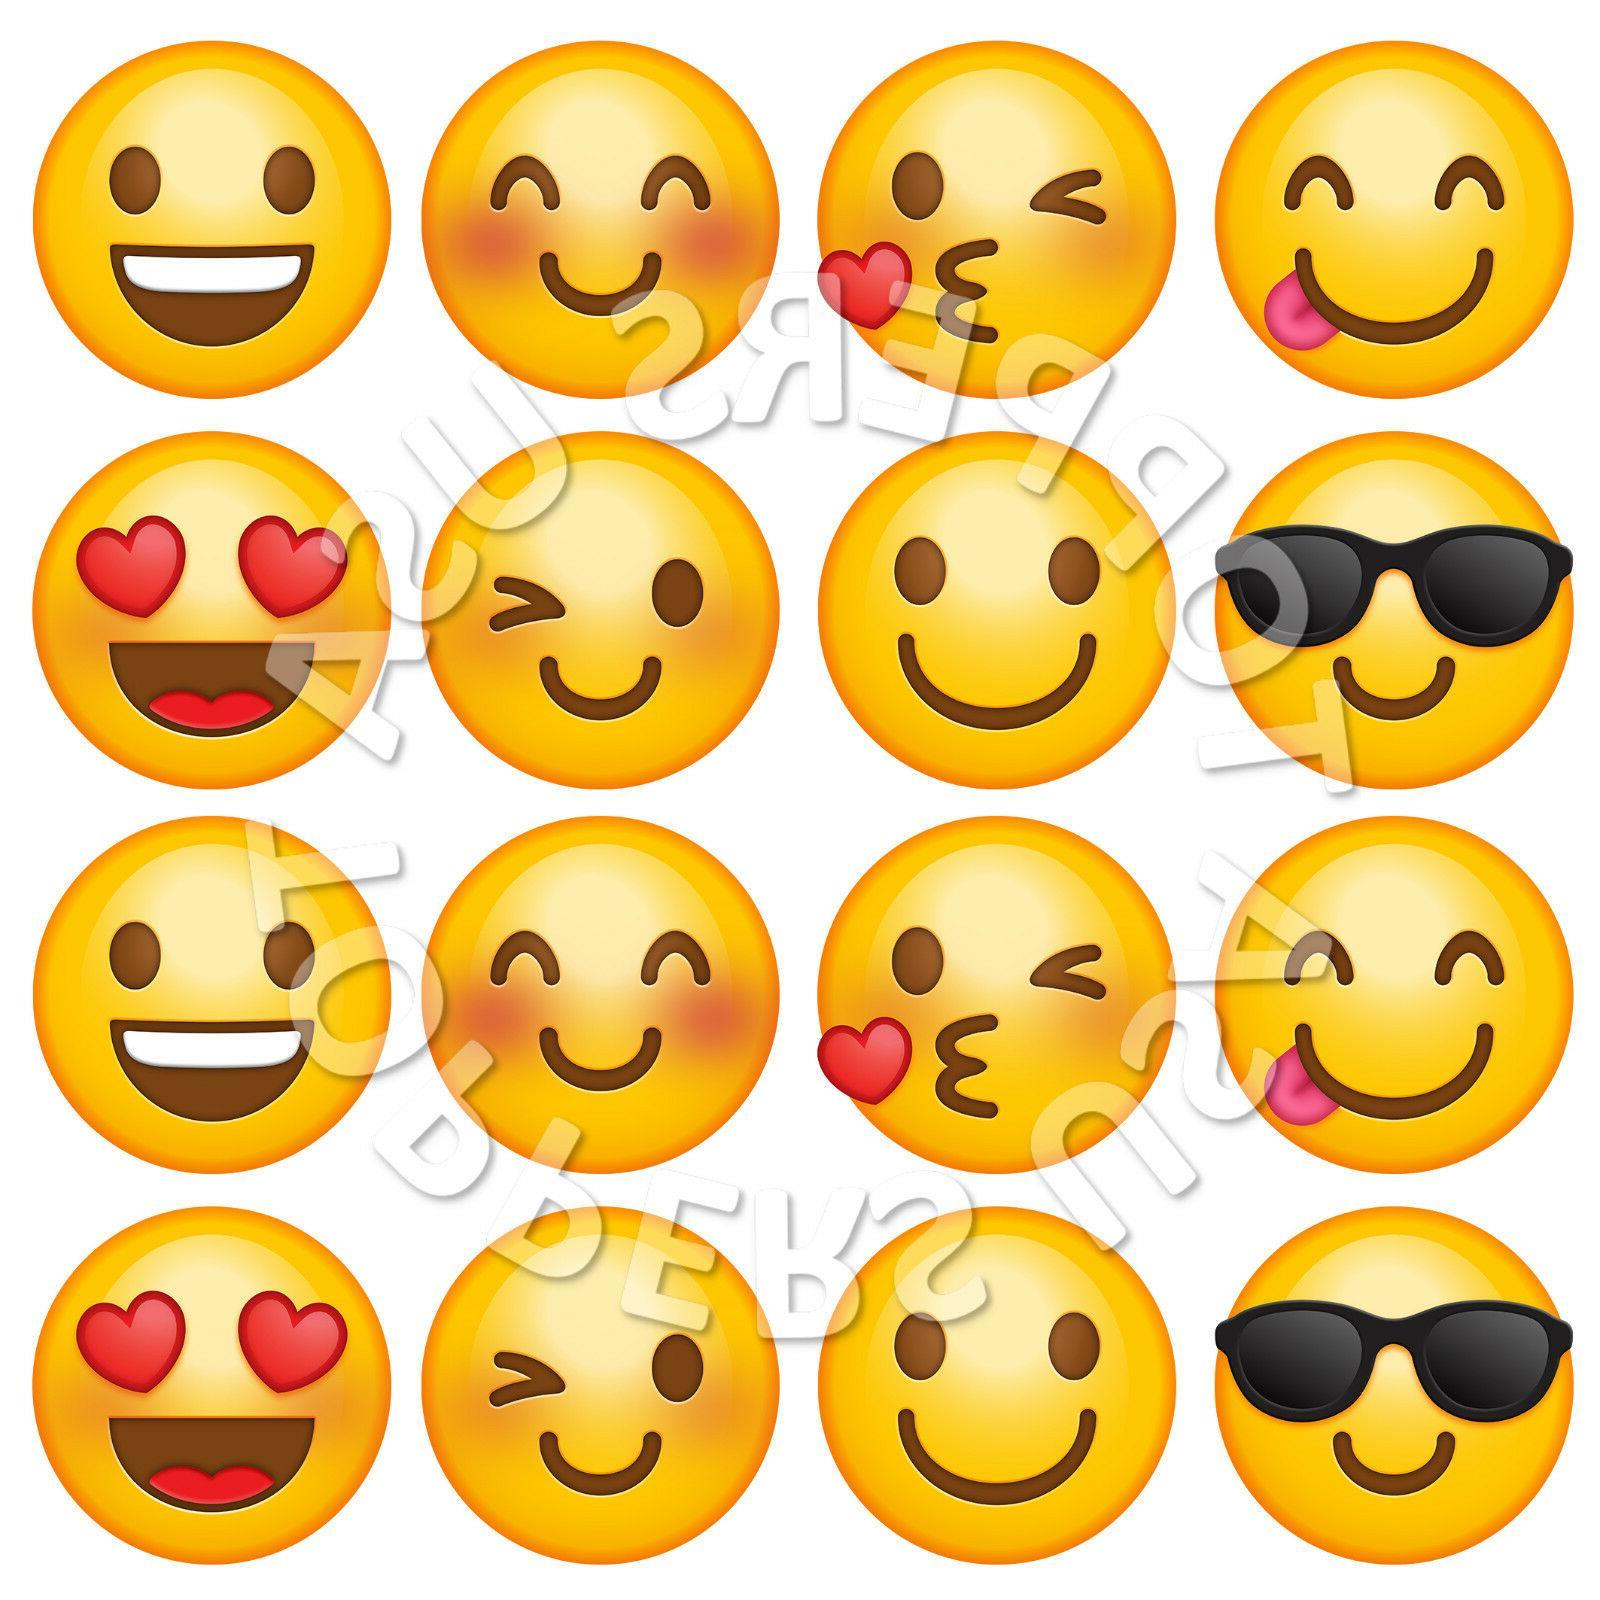 16x edible emoji smiley faces cupcake toppers